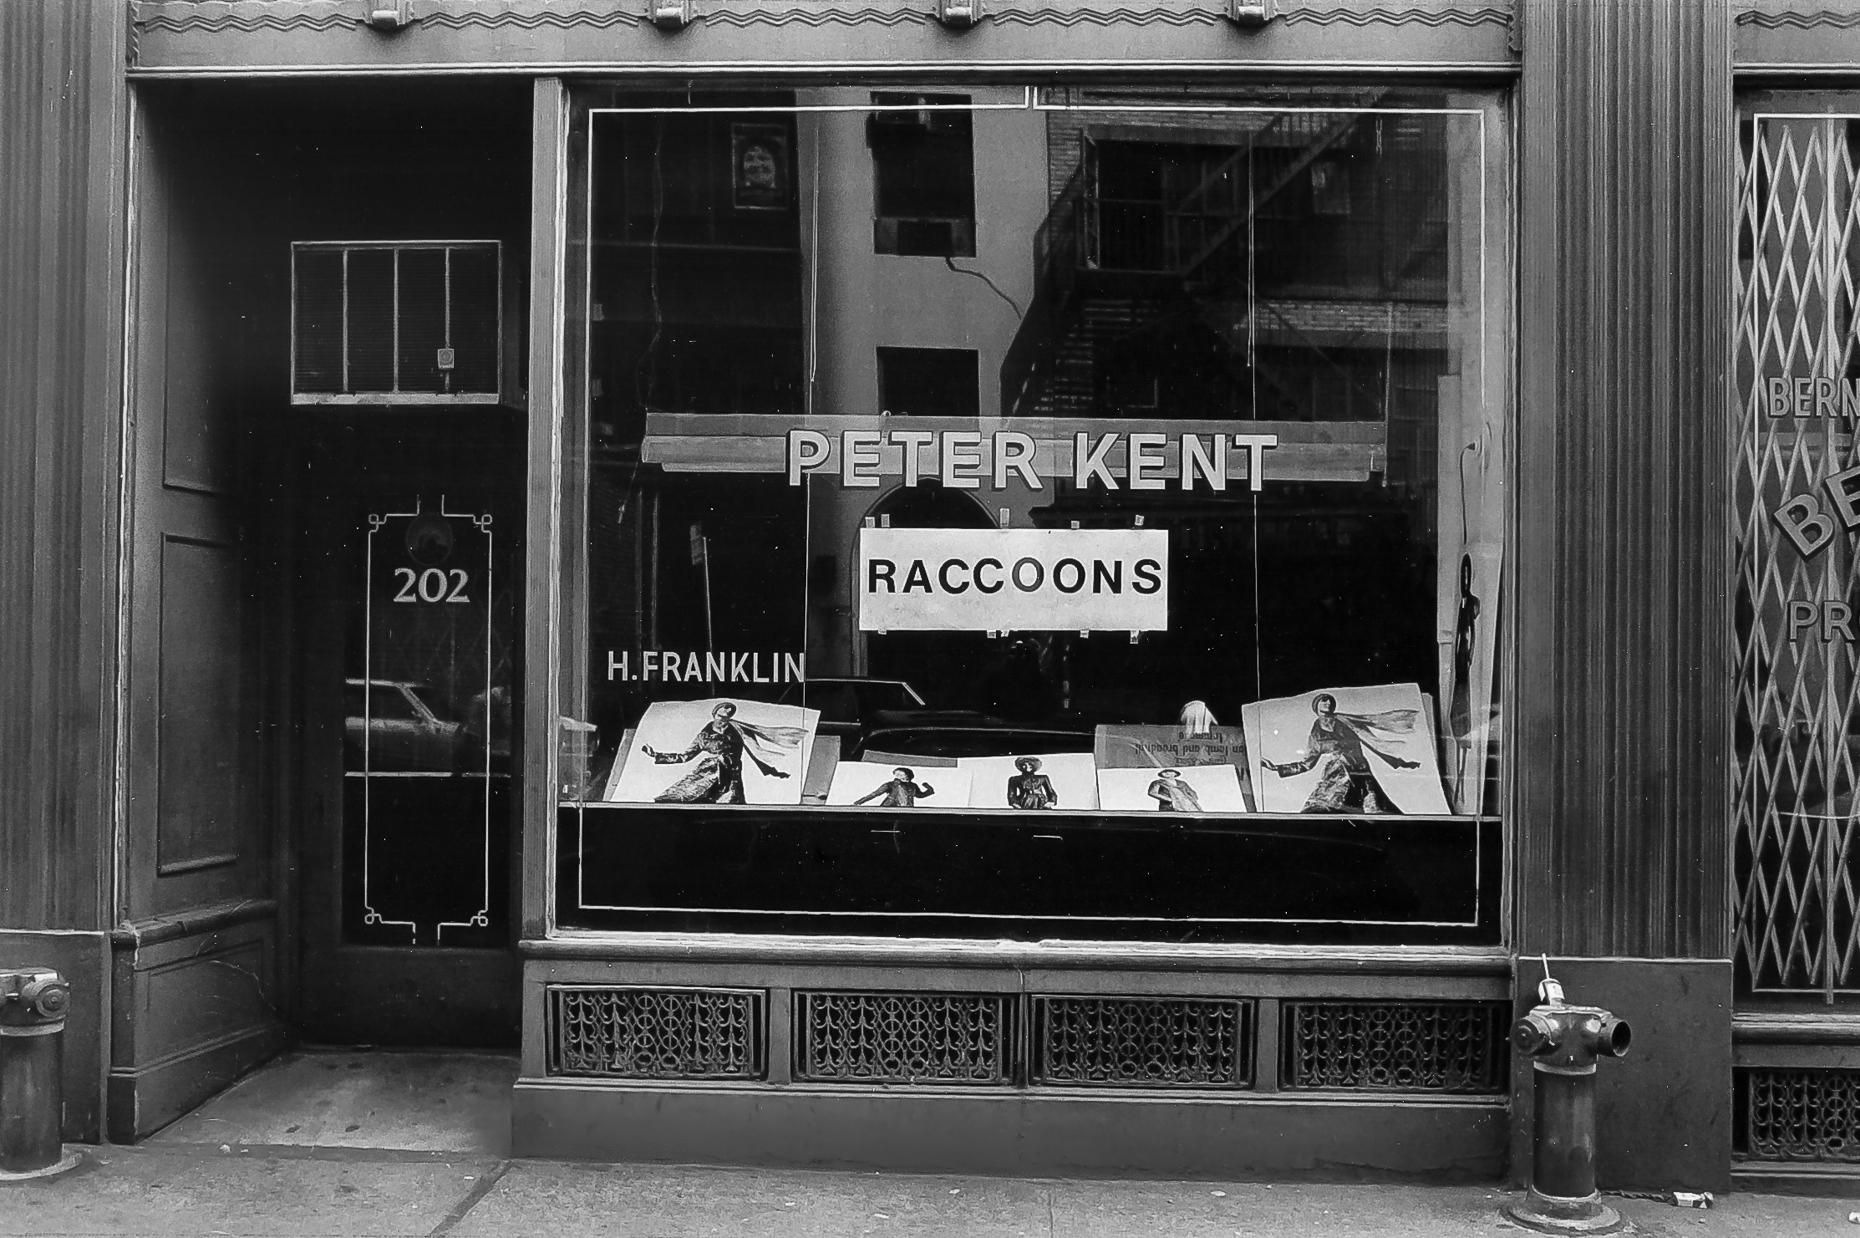 Garment District, NYC, 1974